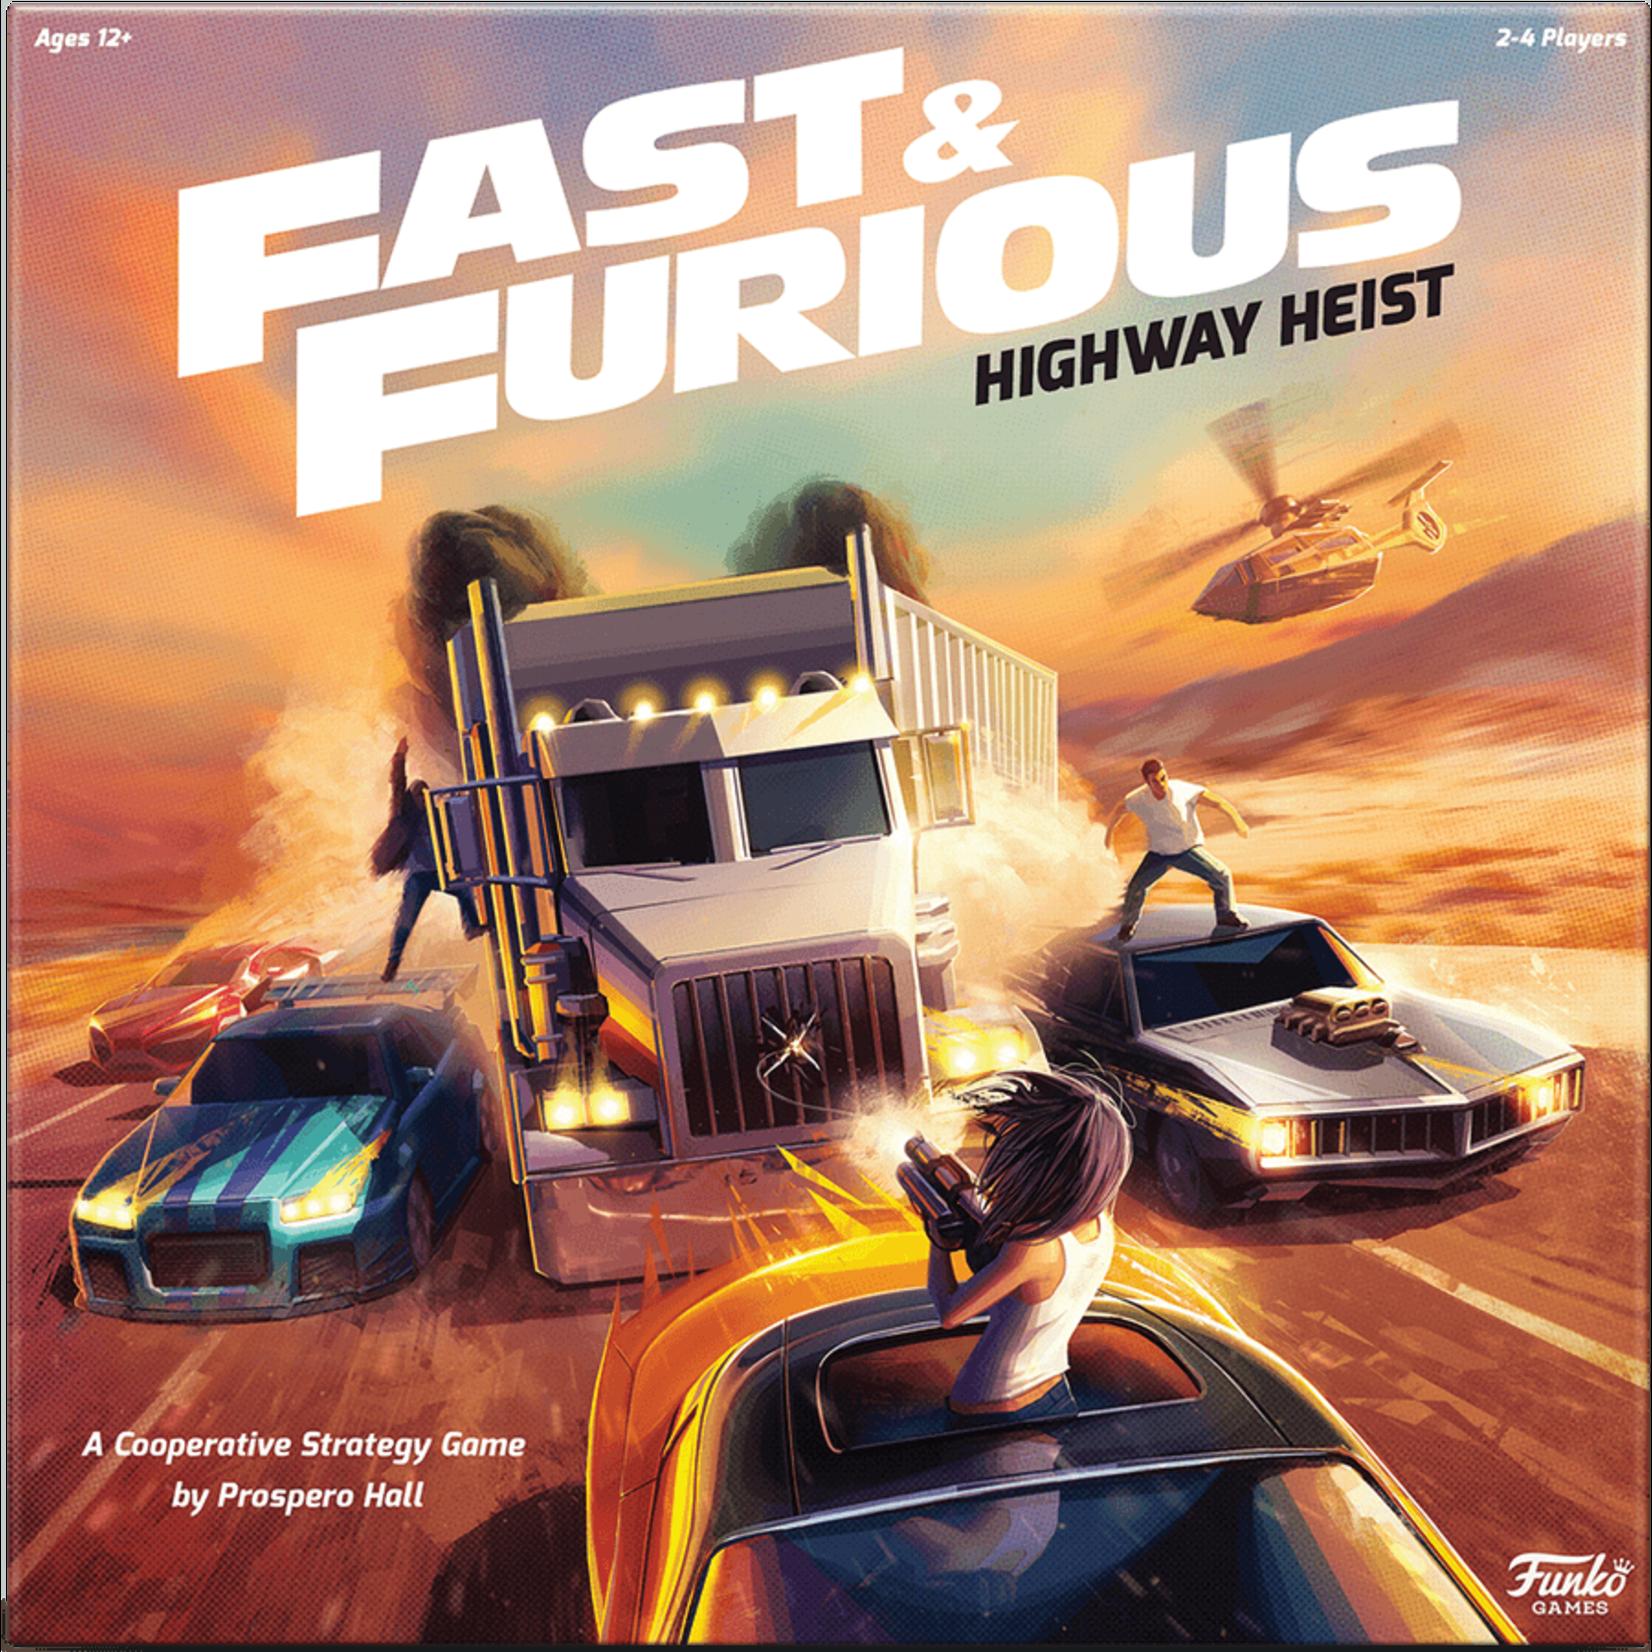 Funko Fast & Furious: Highway Heist